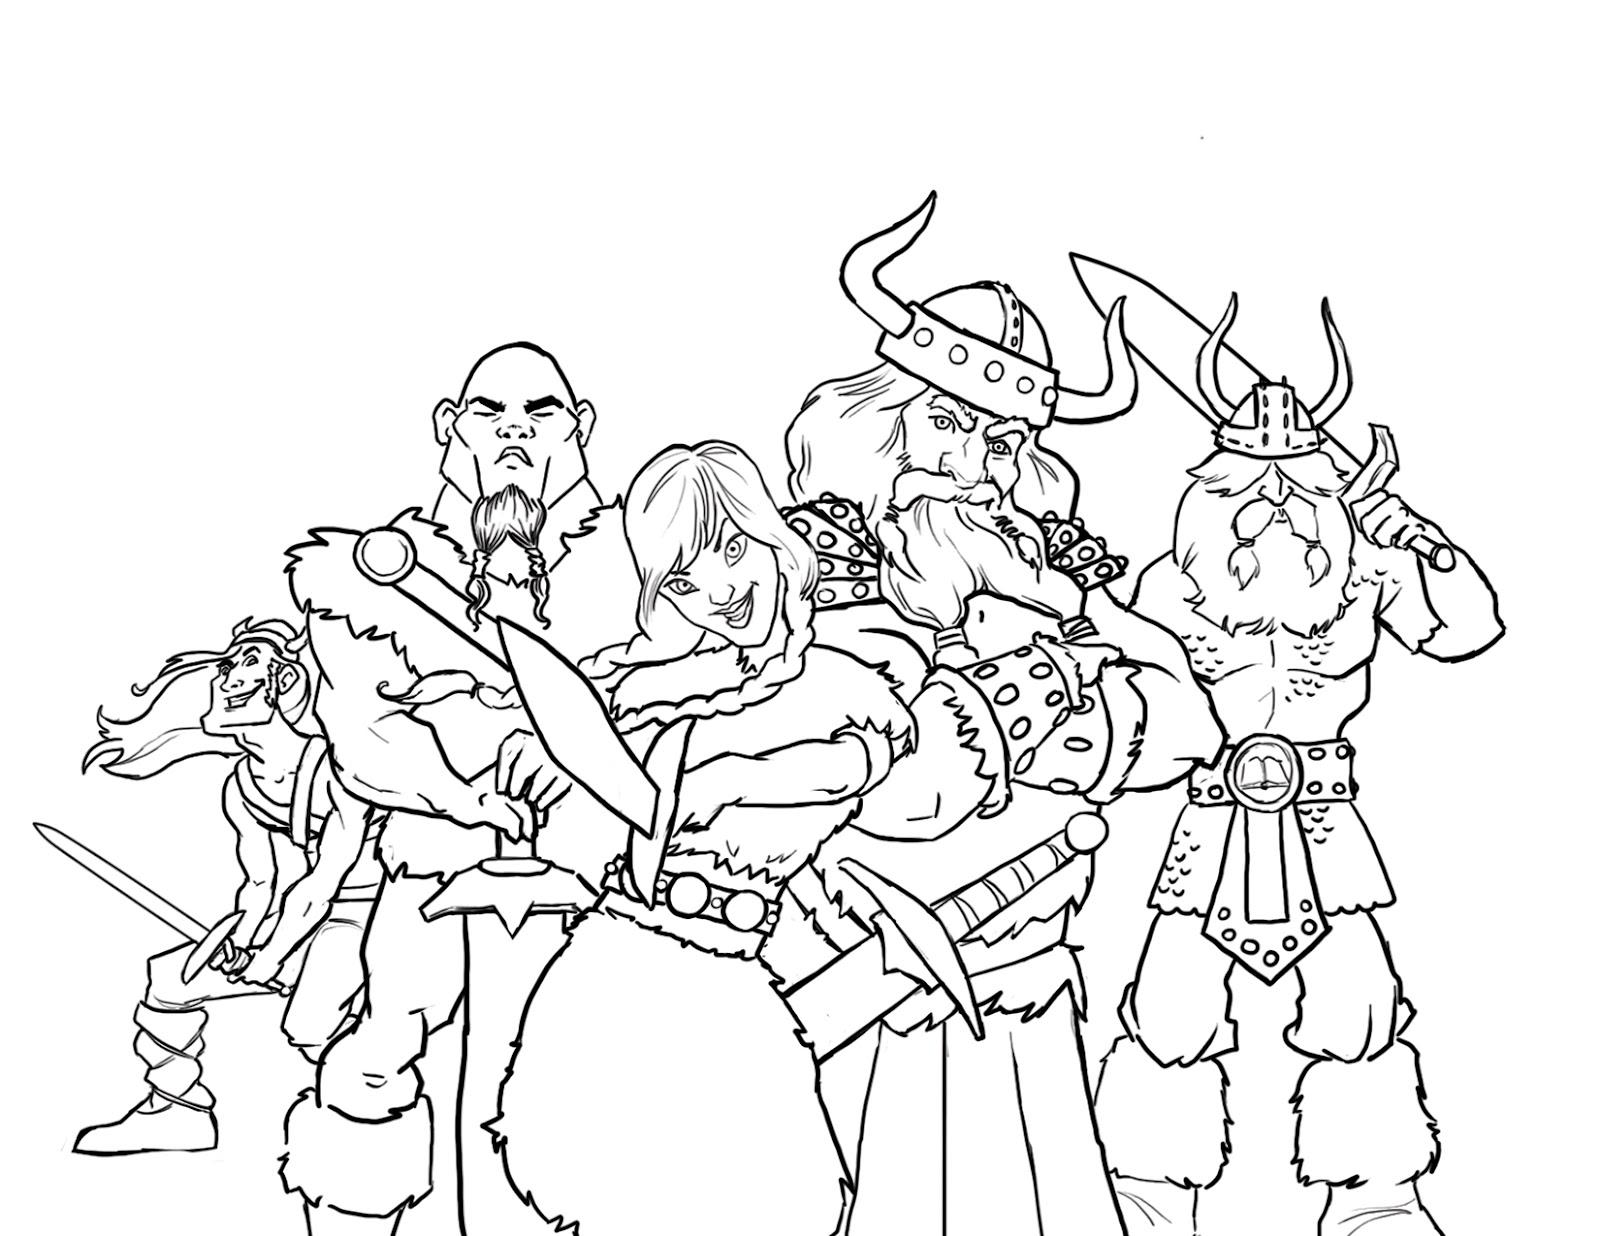 jeneart: Vikings!